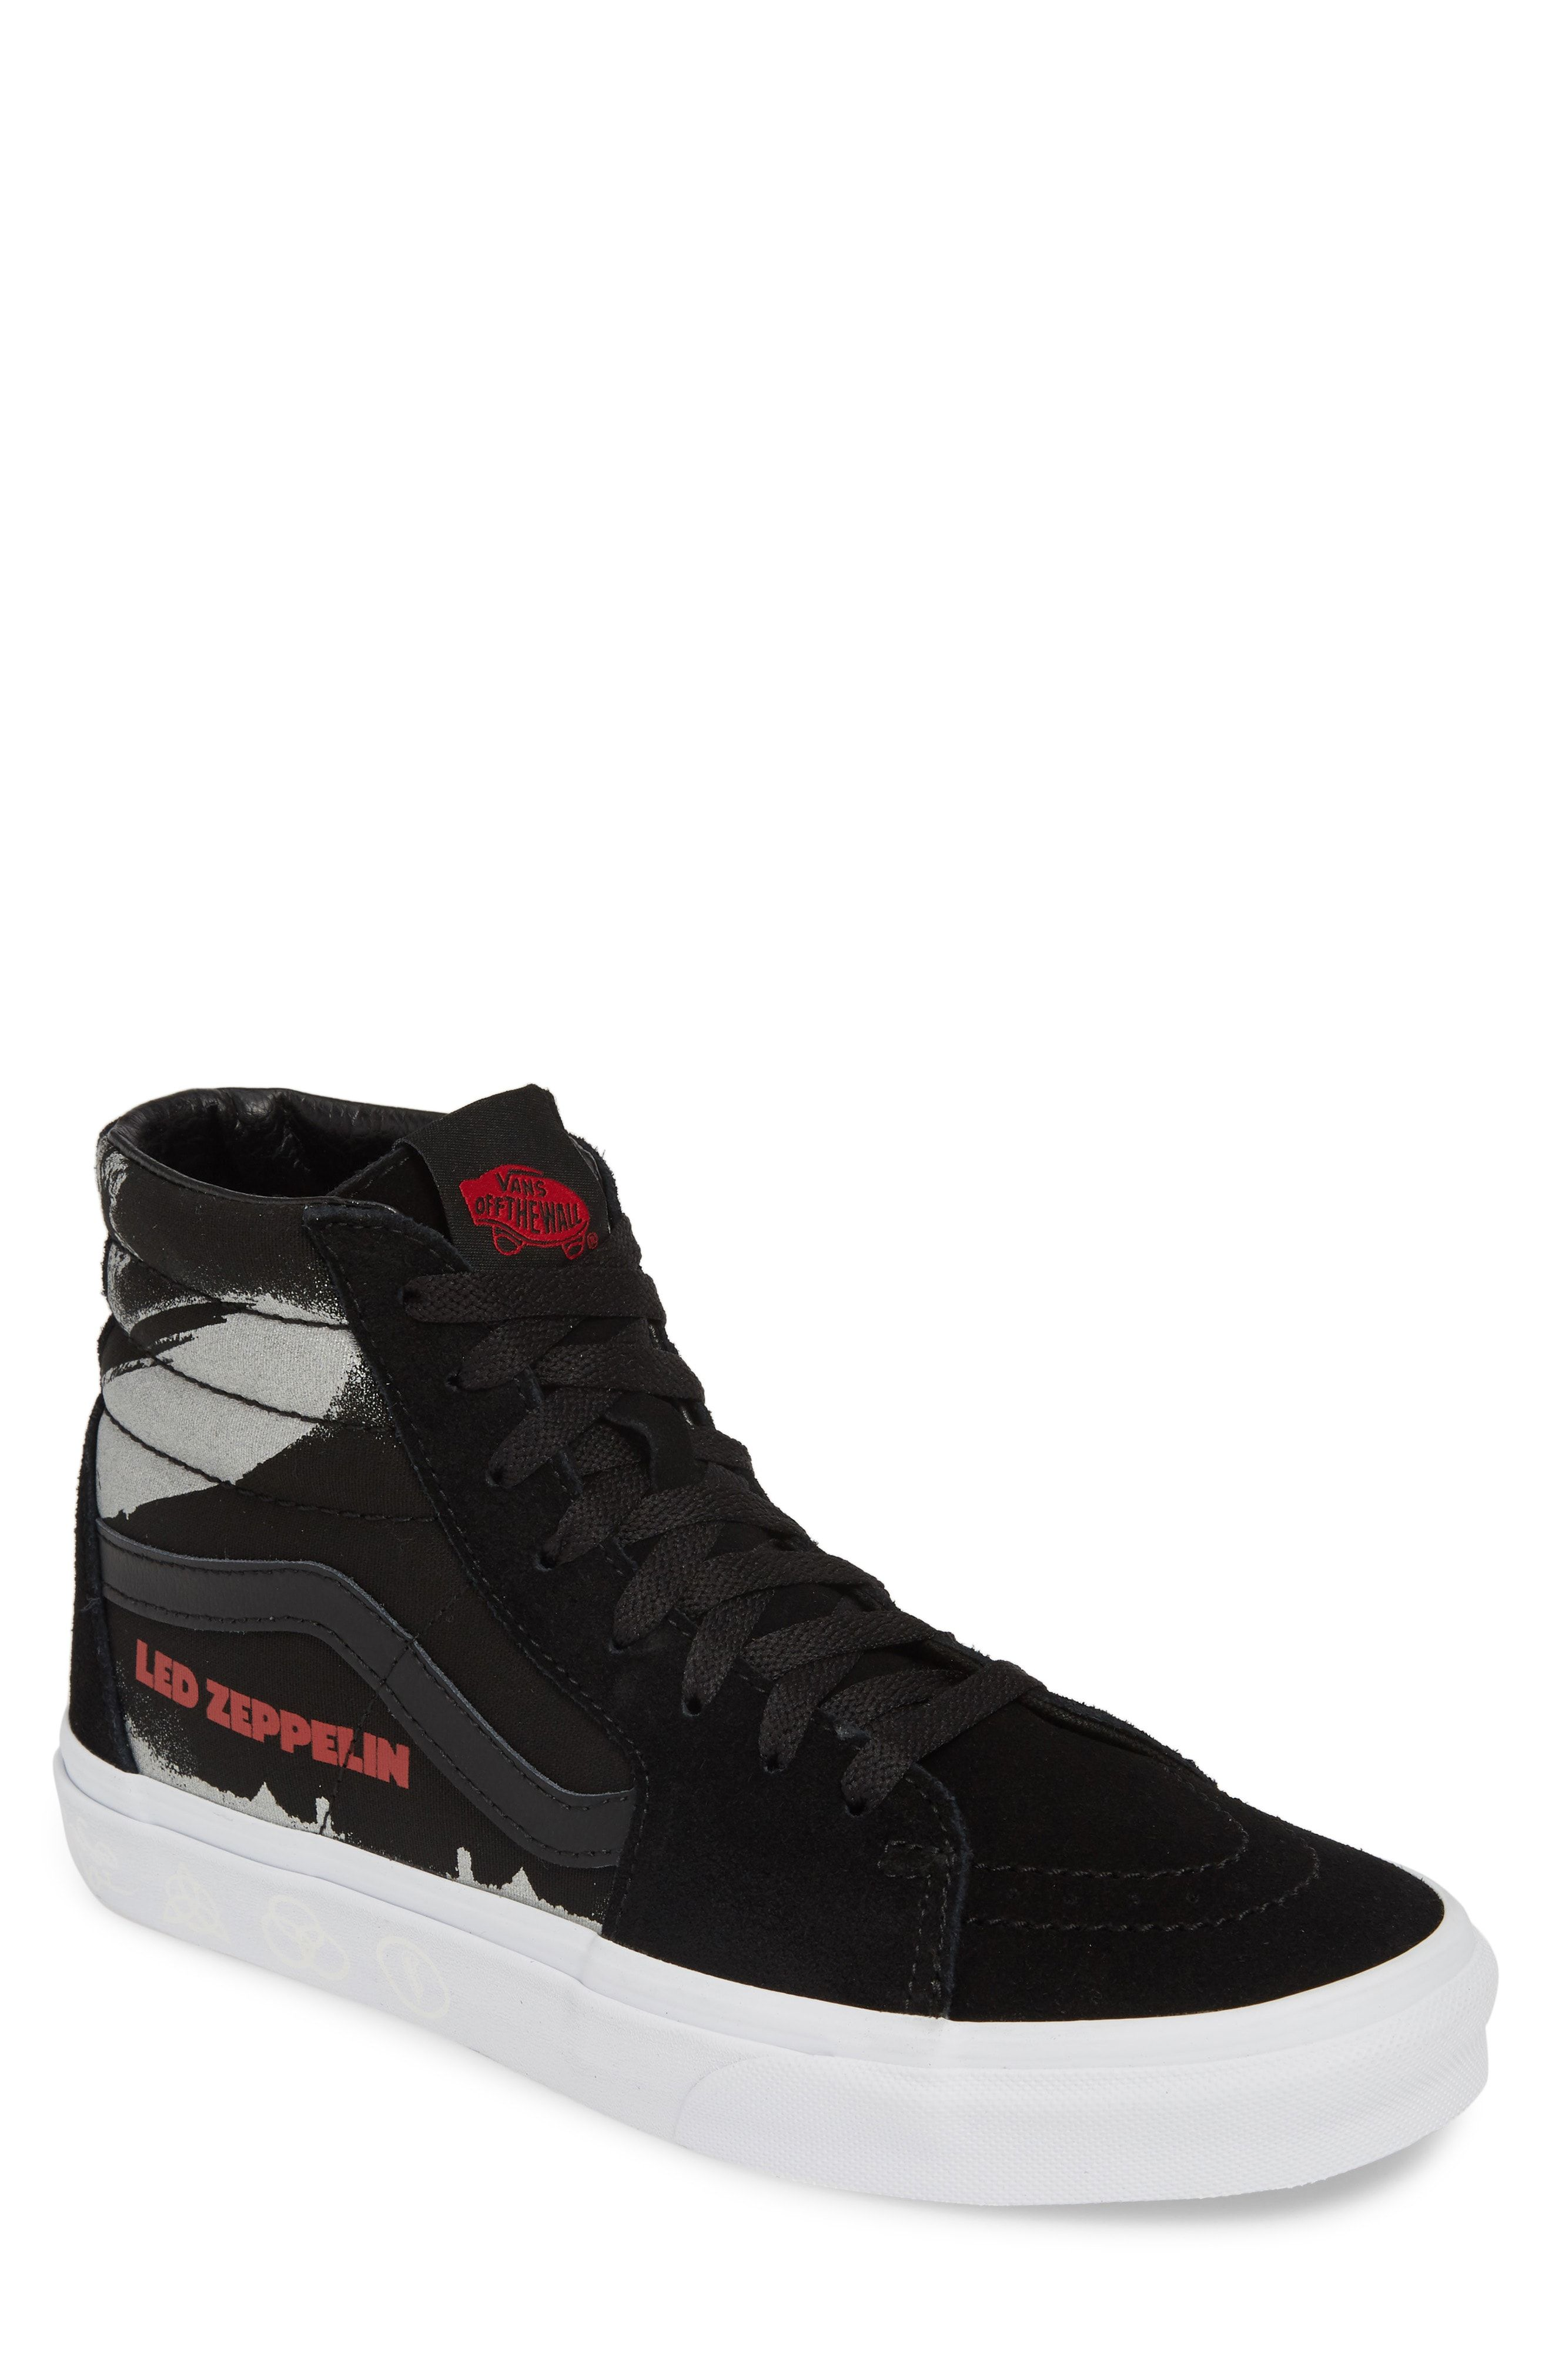 26b78fff6bc844 VANS X LED ZEPPELIN SK8-HI SNEAKER.  vans  shoes